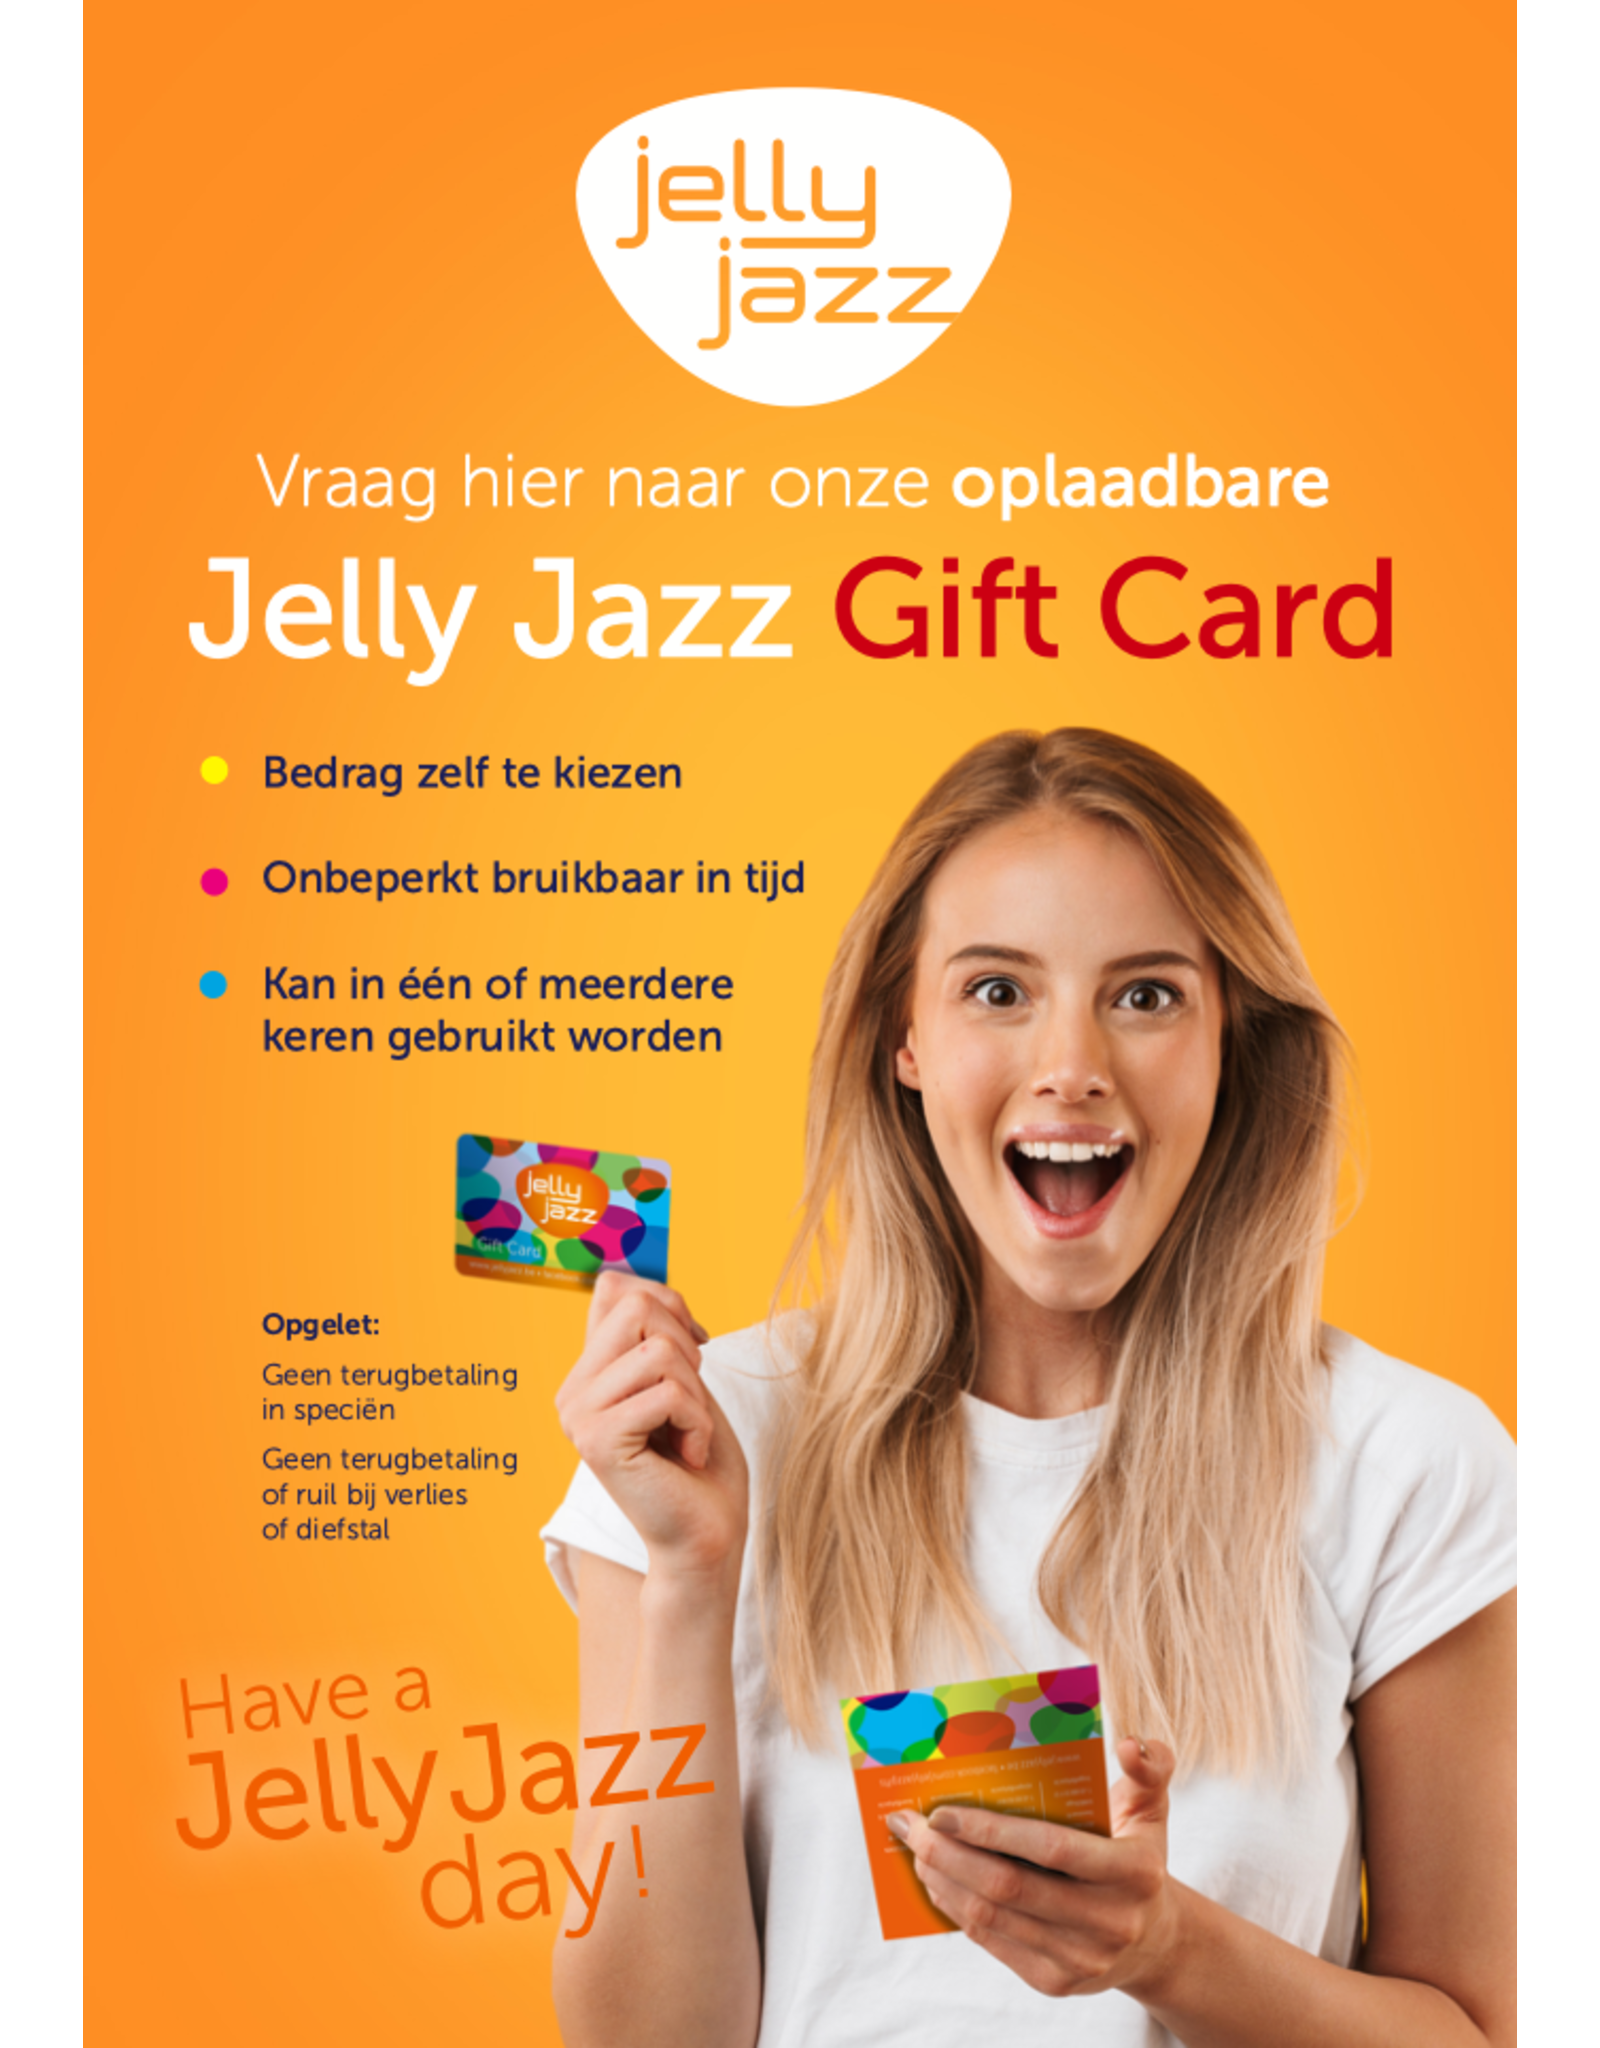 Jelly Jazz gift card €15